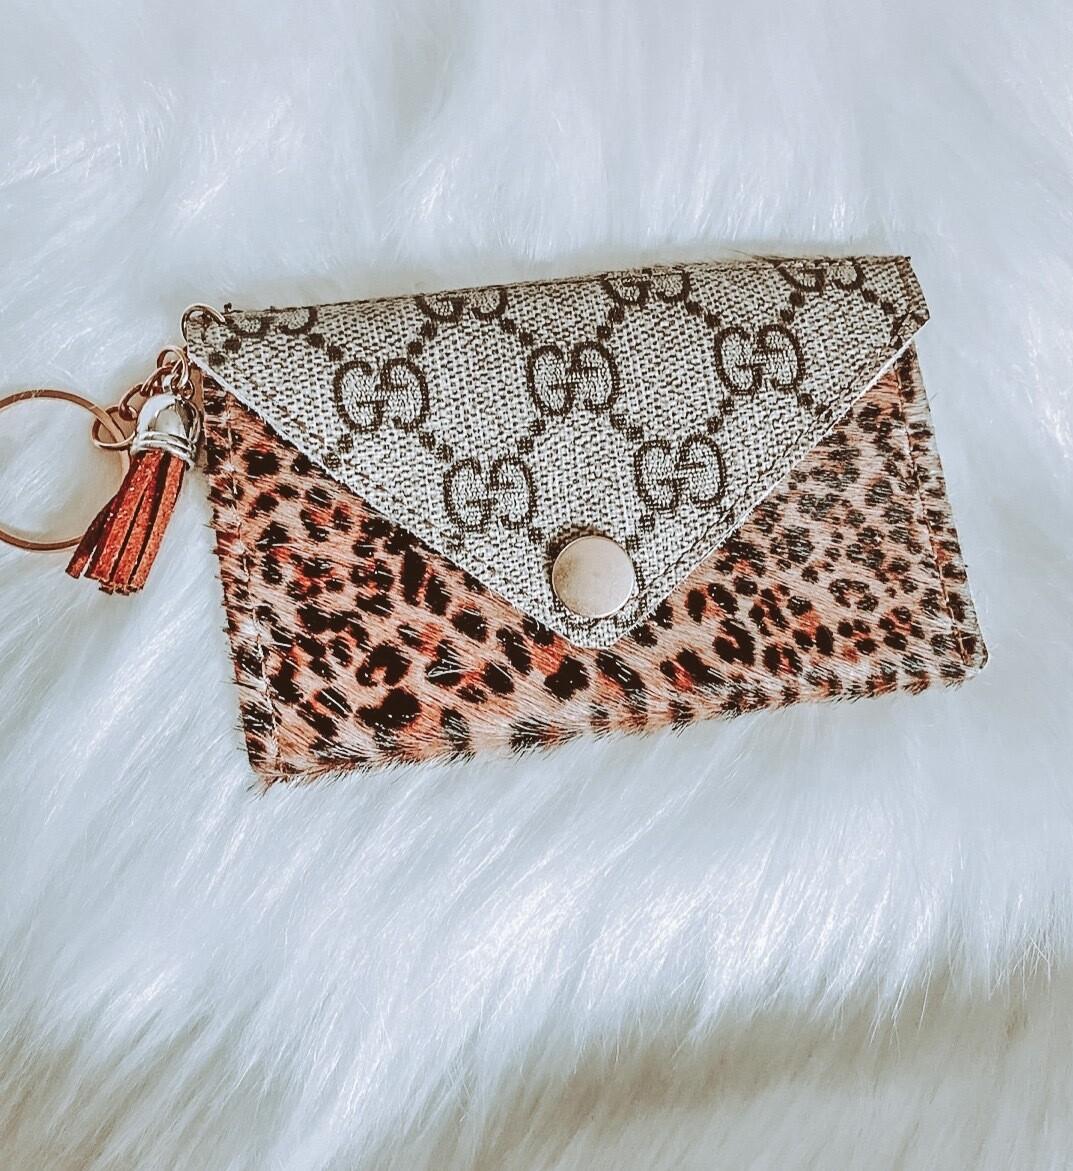 Gucci Cheetah Cardholder